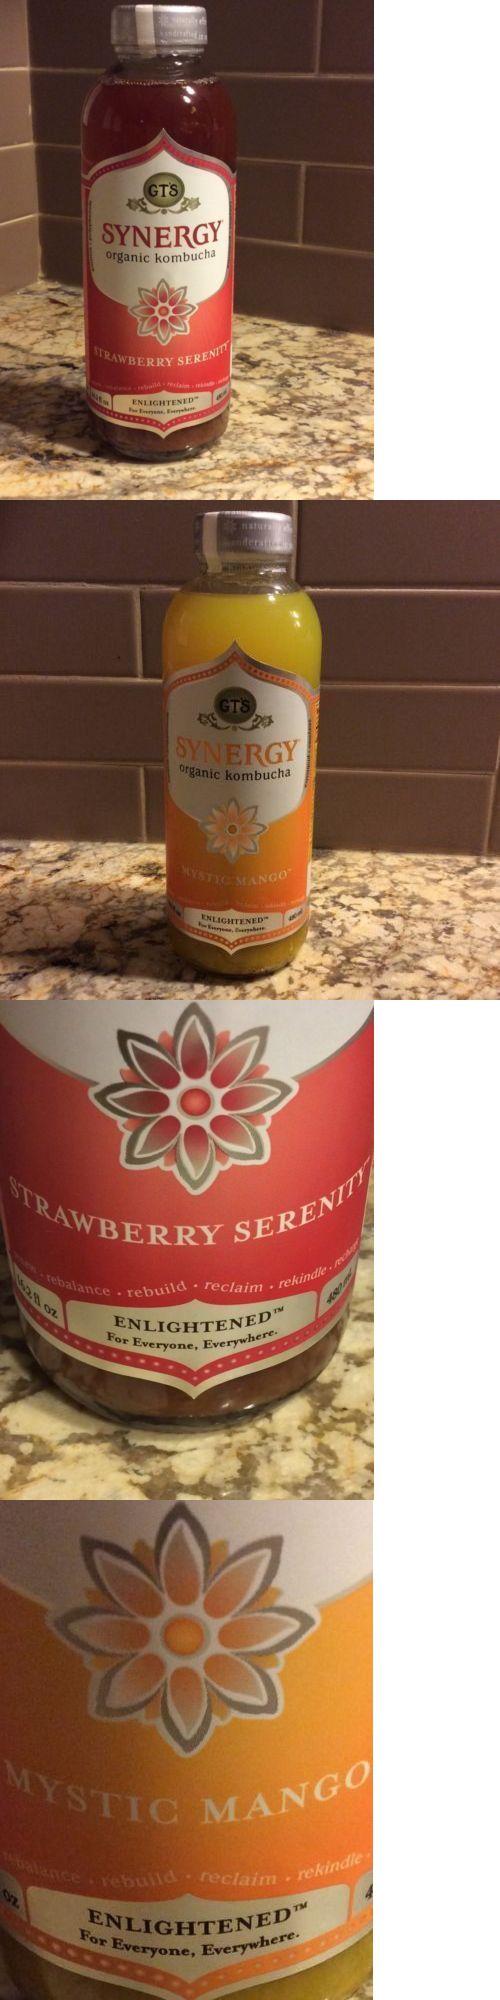 Fruit Juices 179176: Gts Synergy Organic Kombucha Mystic Mangoandstrawberry Serenity-16.2 Oz-12 Case -> BUY IT NOW ONLY: $79.95 on eBay!